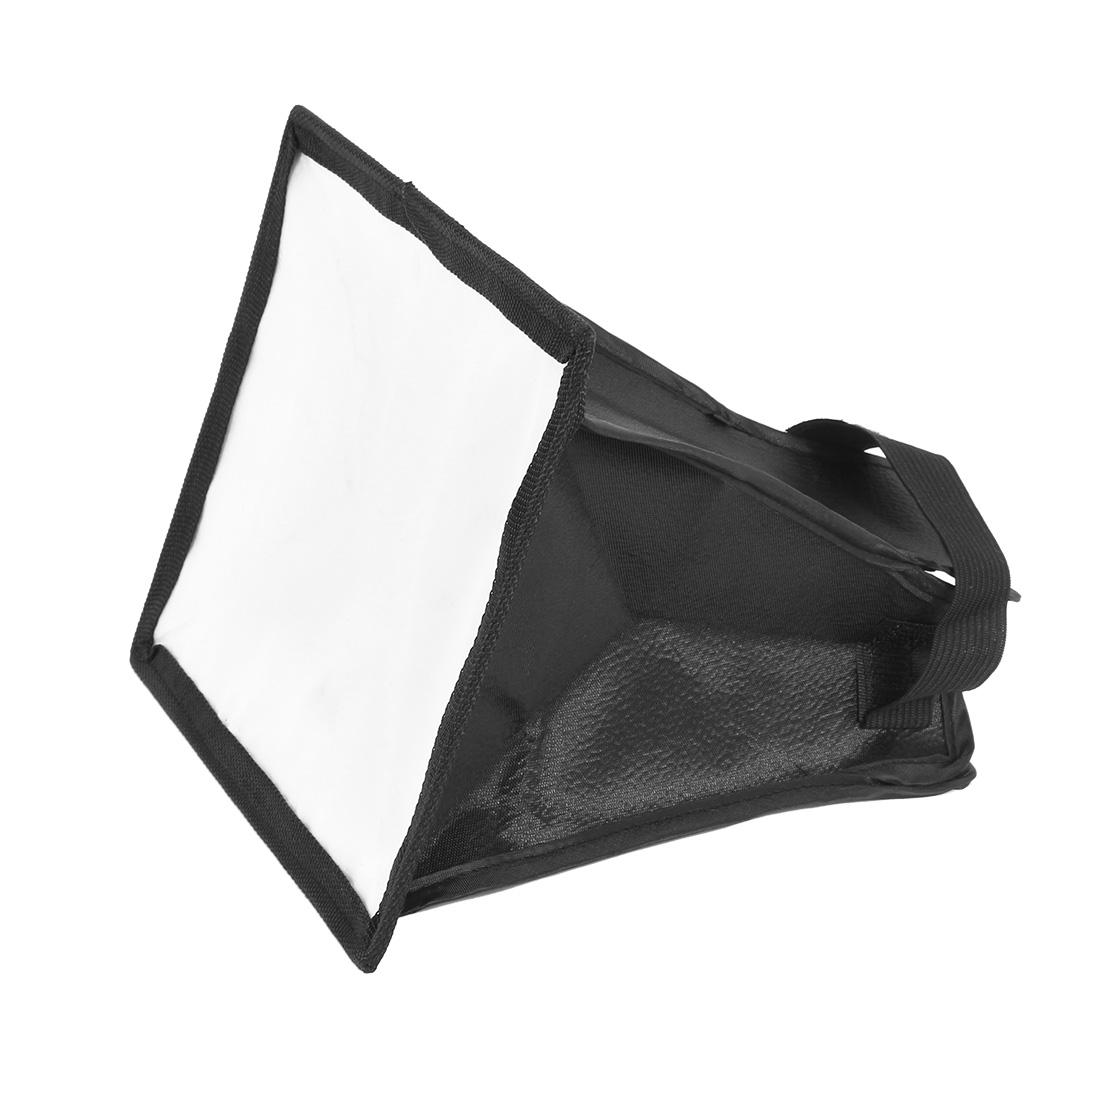 15cm x 20cm Universal Foldable Flash Light Diffuser Soft Box for DSLR Camera